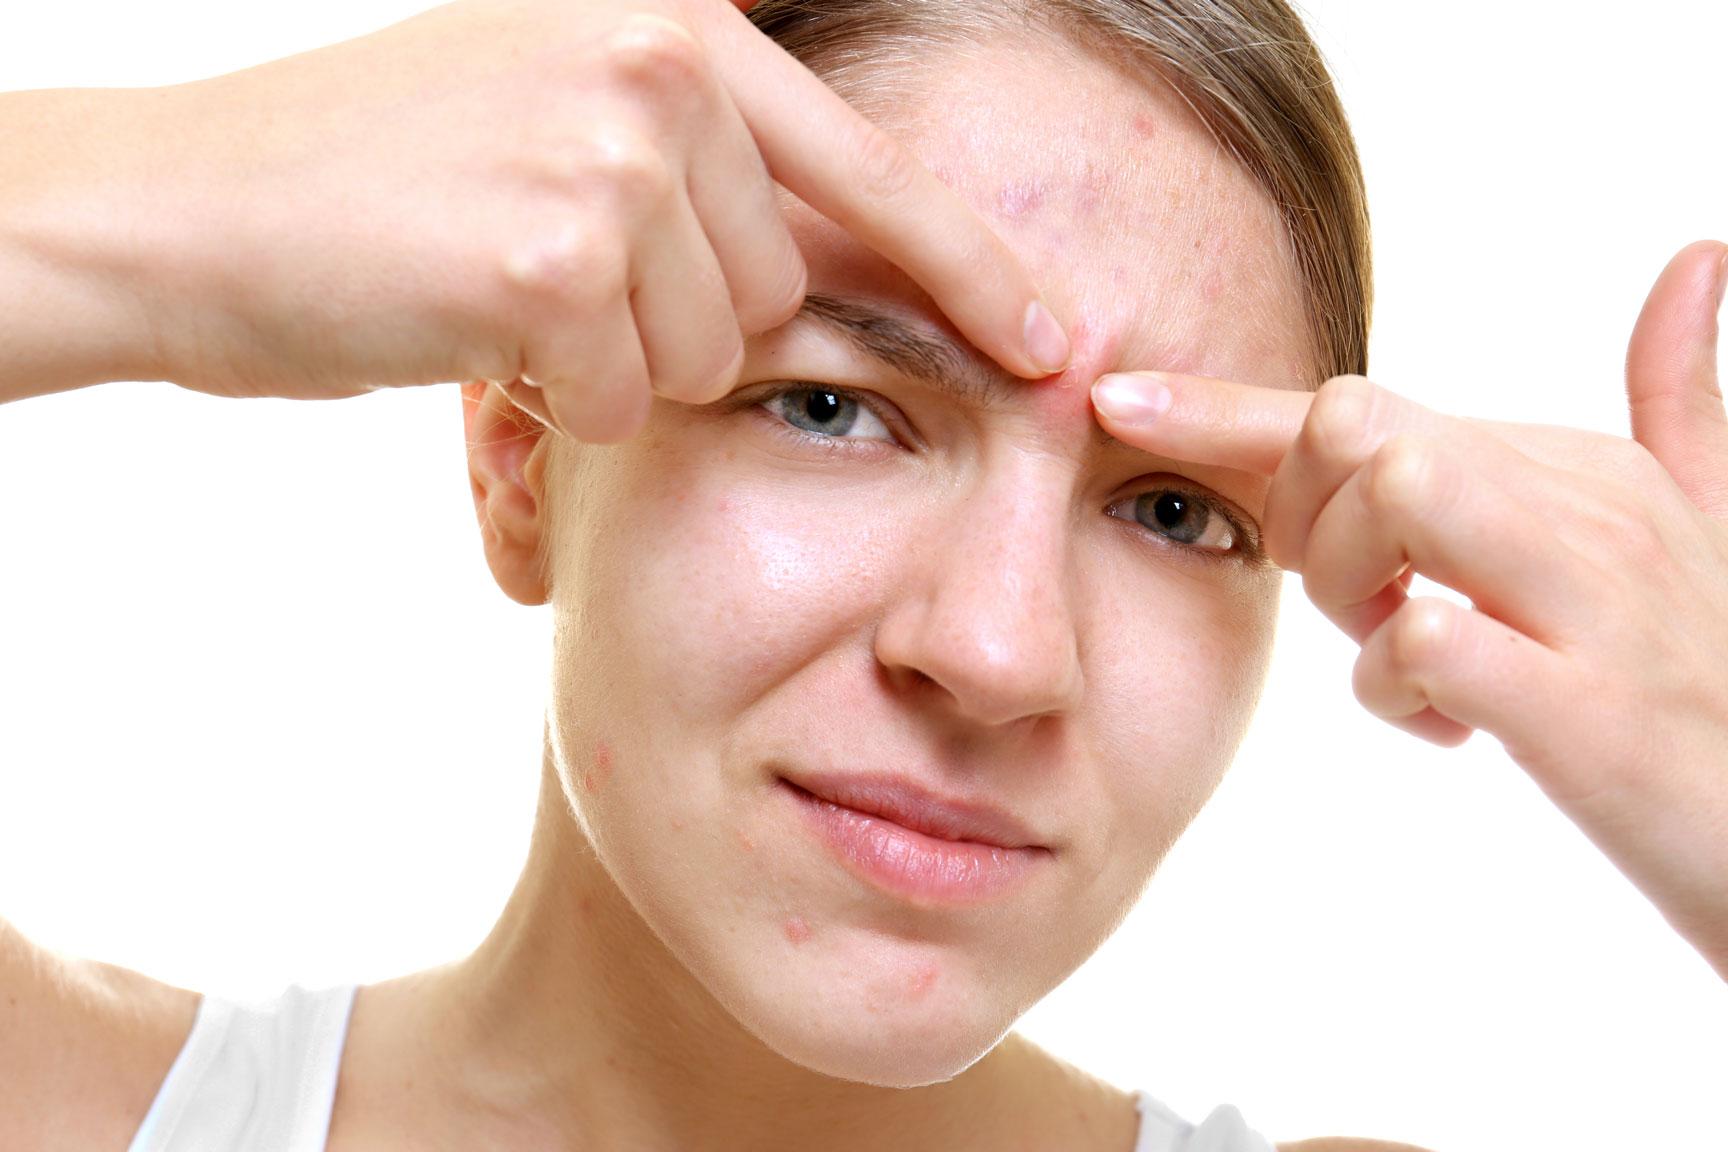 Inflamed facial nerve headache eyebrow — photo 15